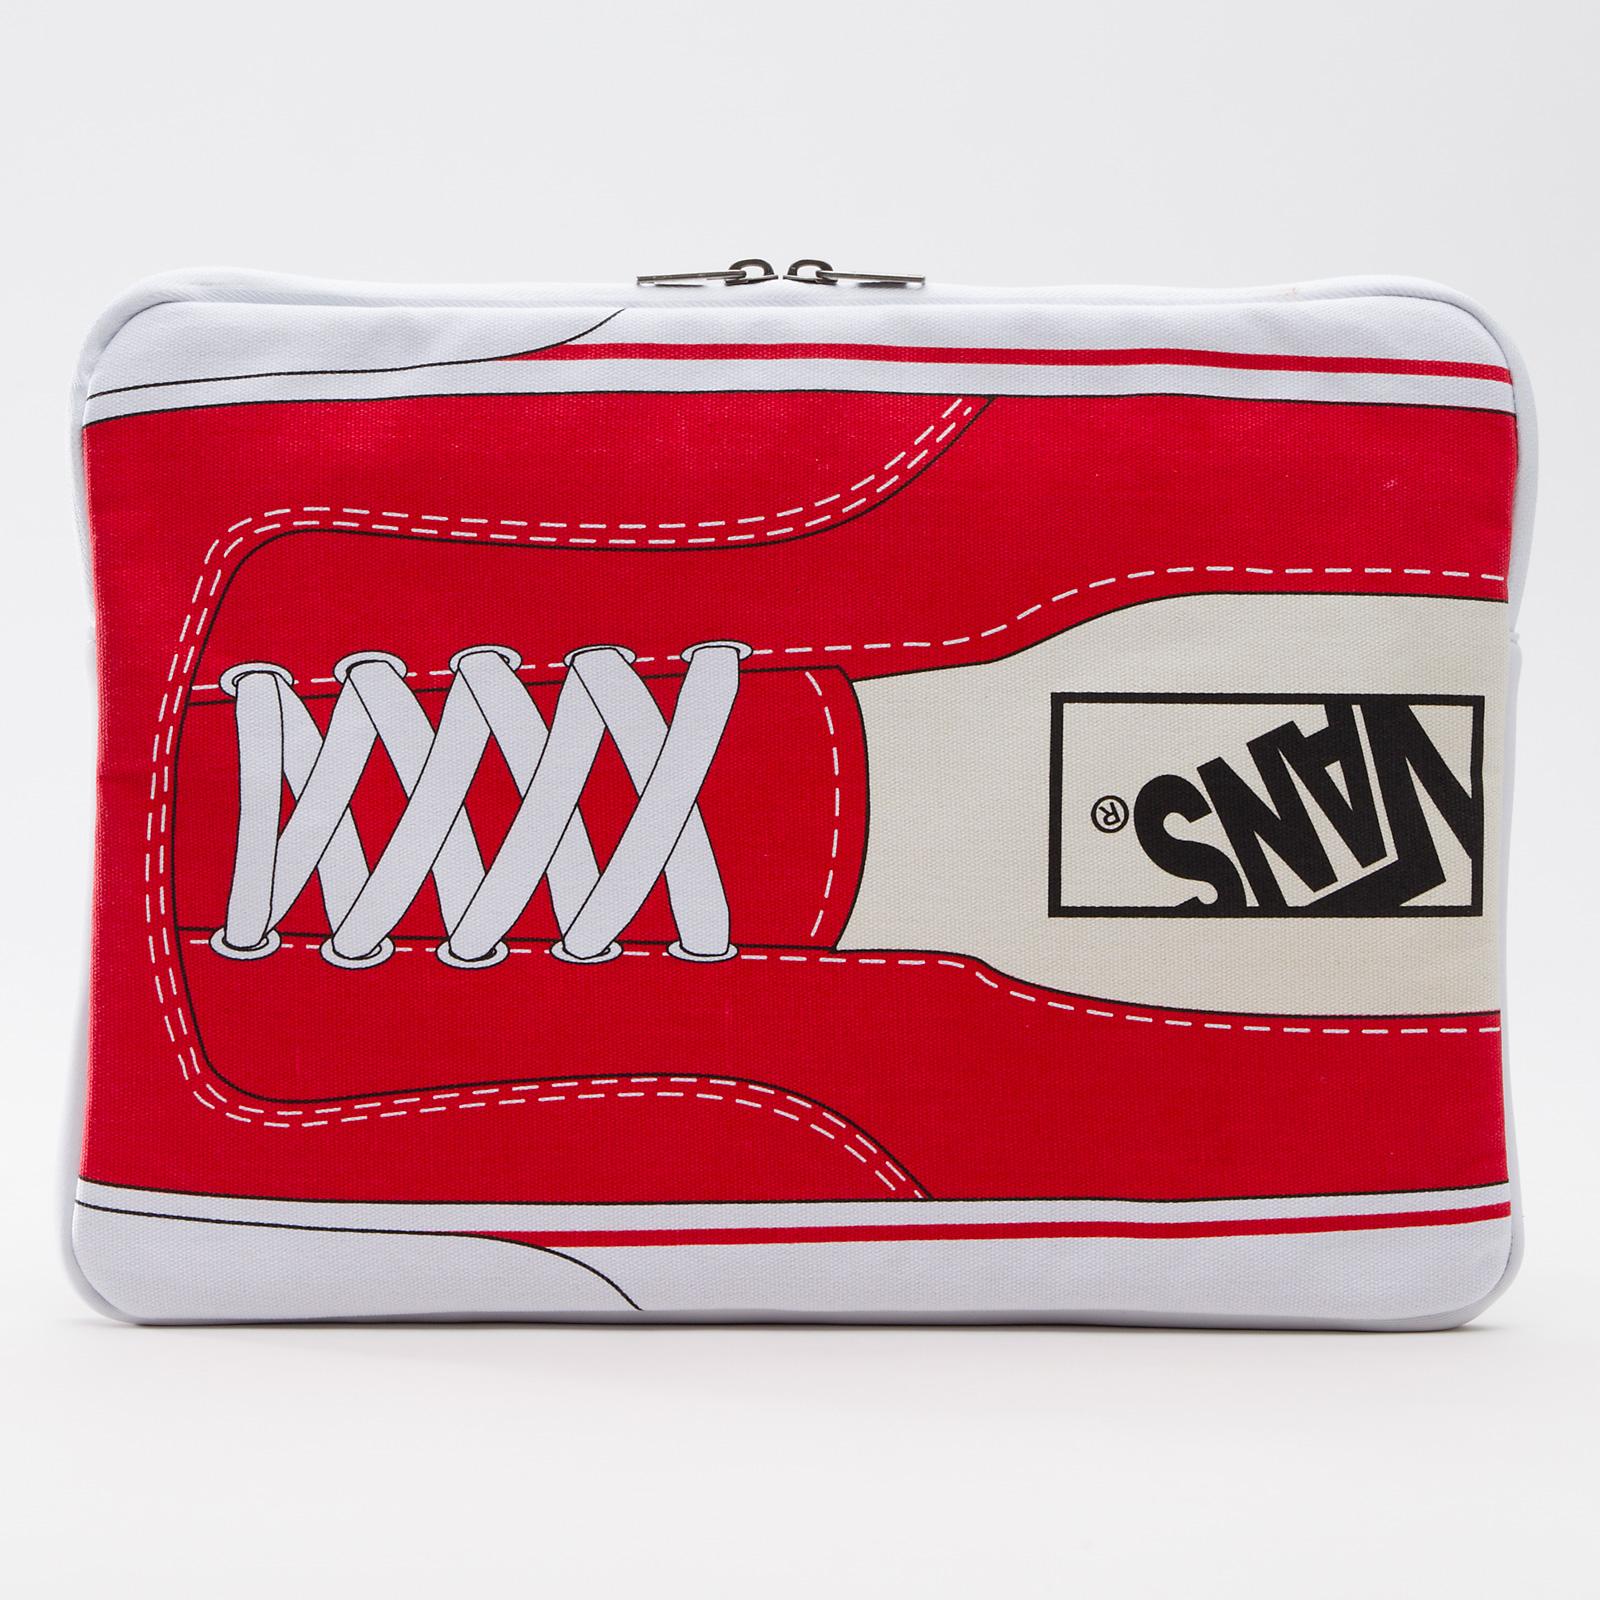 "Pokrowiec Vans Na Laptop 15"" Shoe Print"